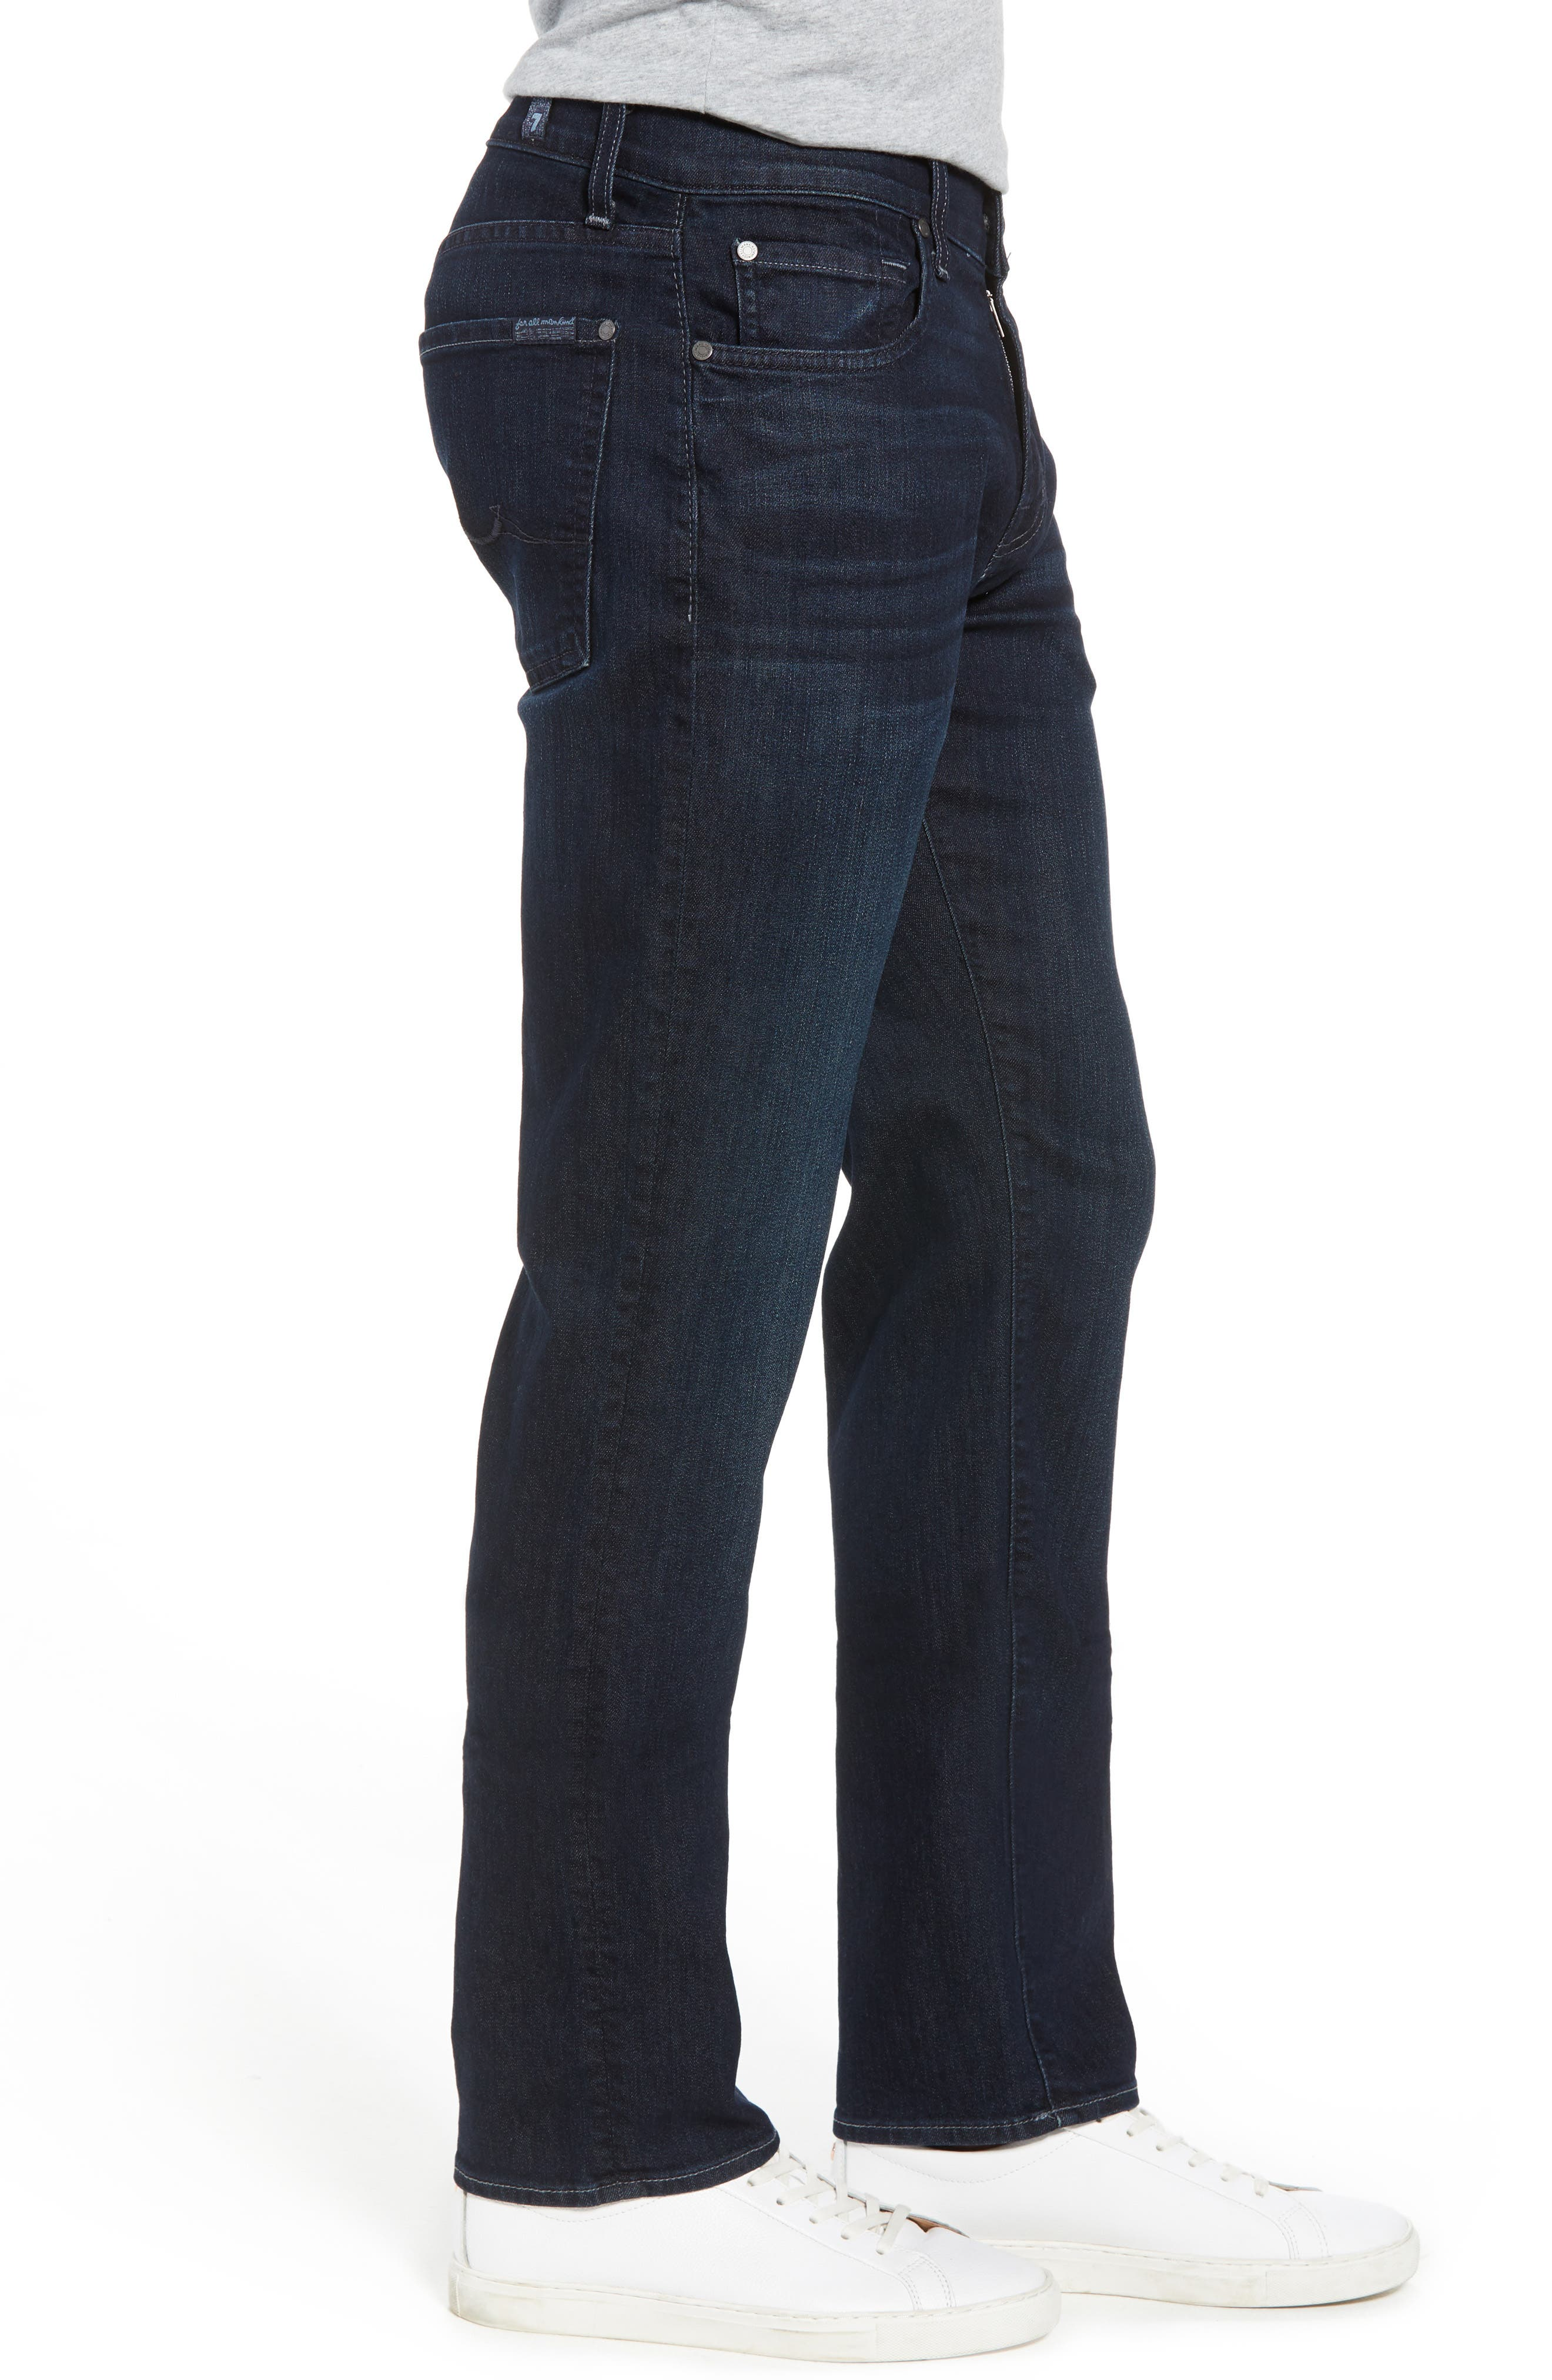 Airweft Standard Straight Leg Jeans,                             Alternate thumbnail 3, color,                             PERENNIAL